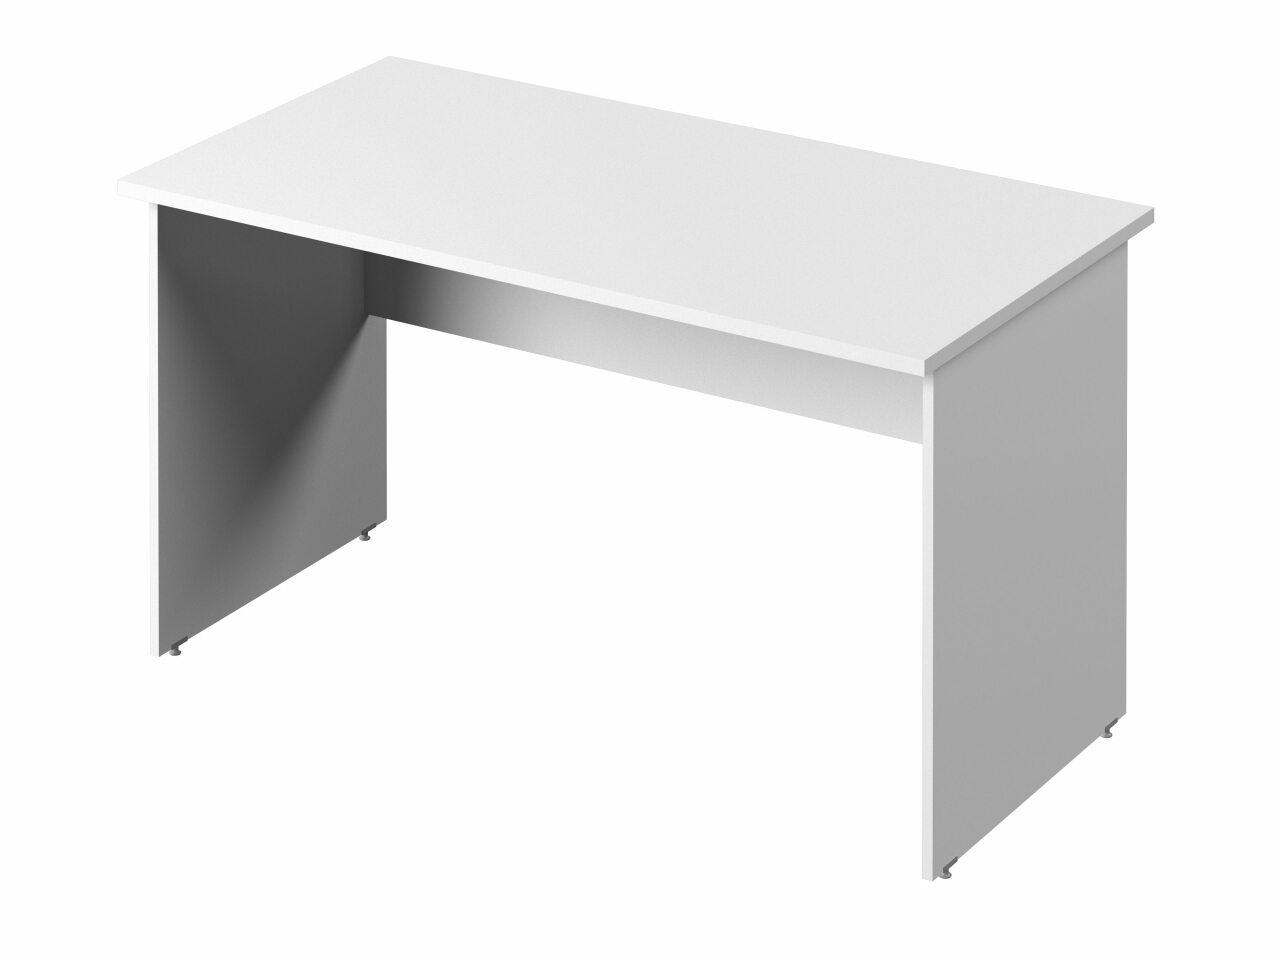 Стол прямой с опорами из ЛДСП  Public Comfort 135x70x74 - фото 6